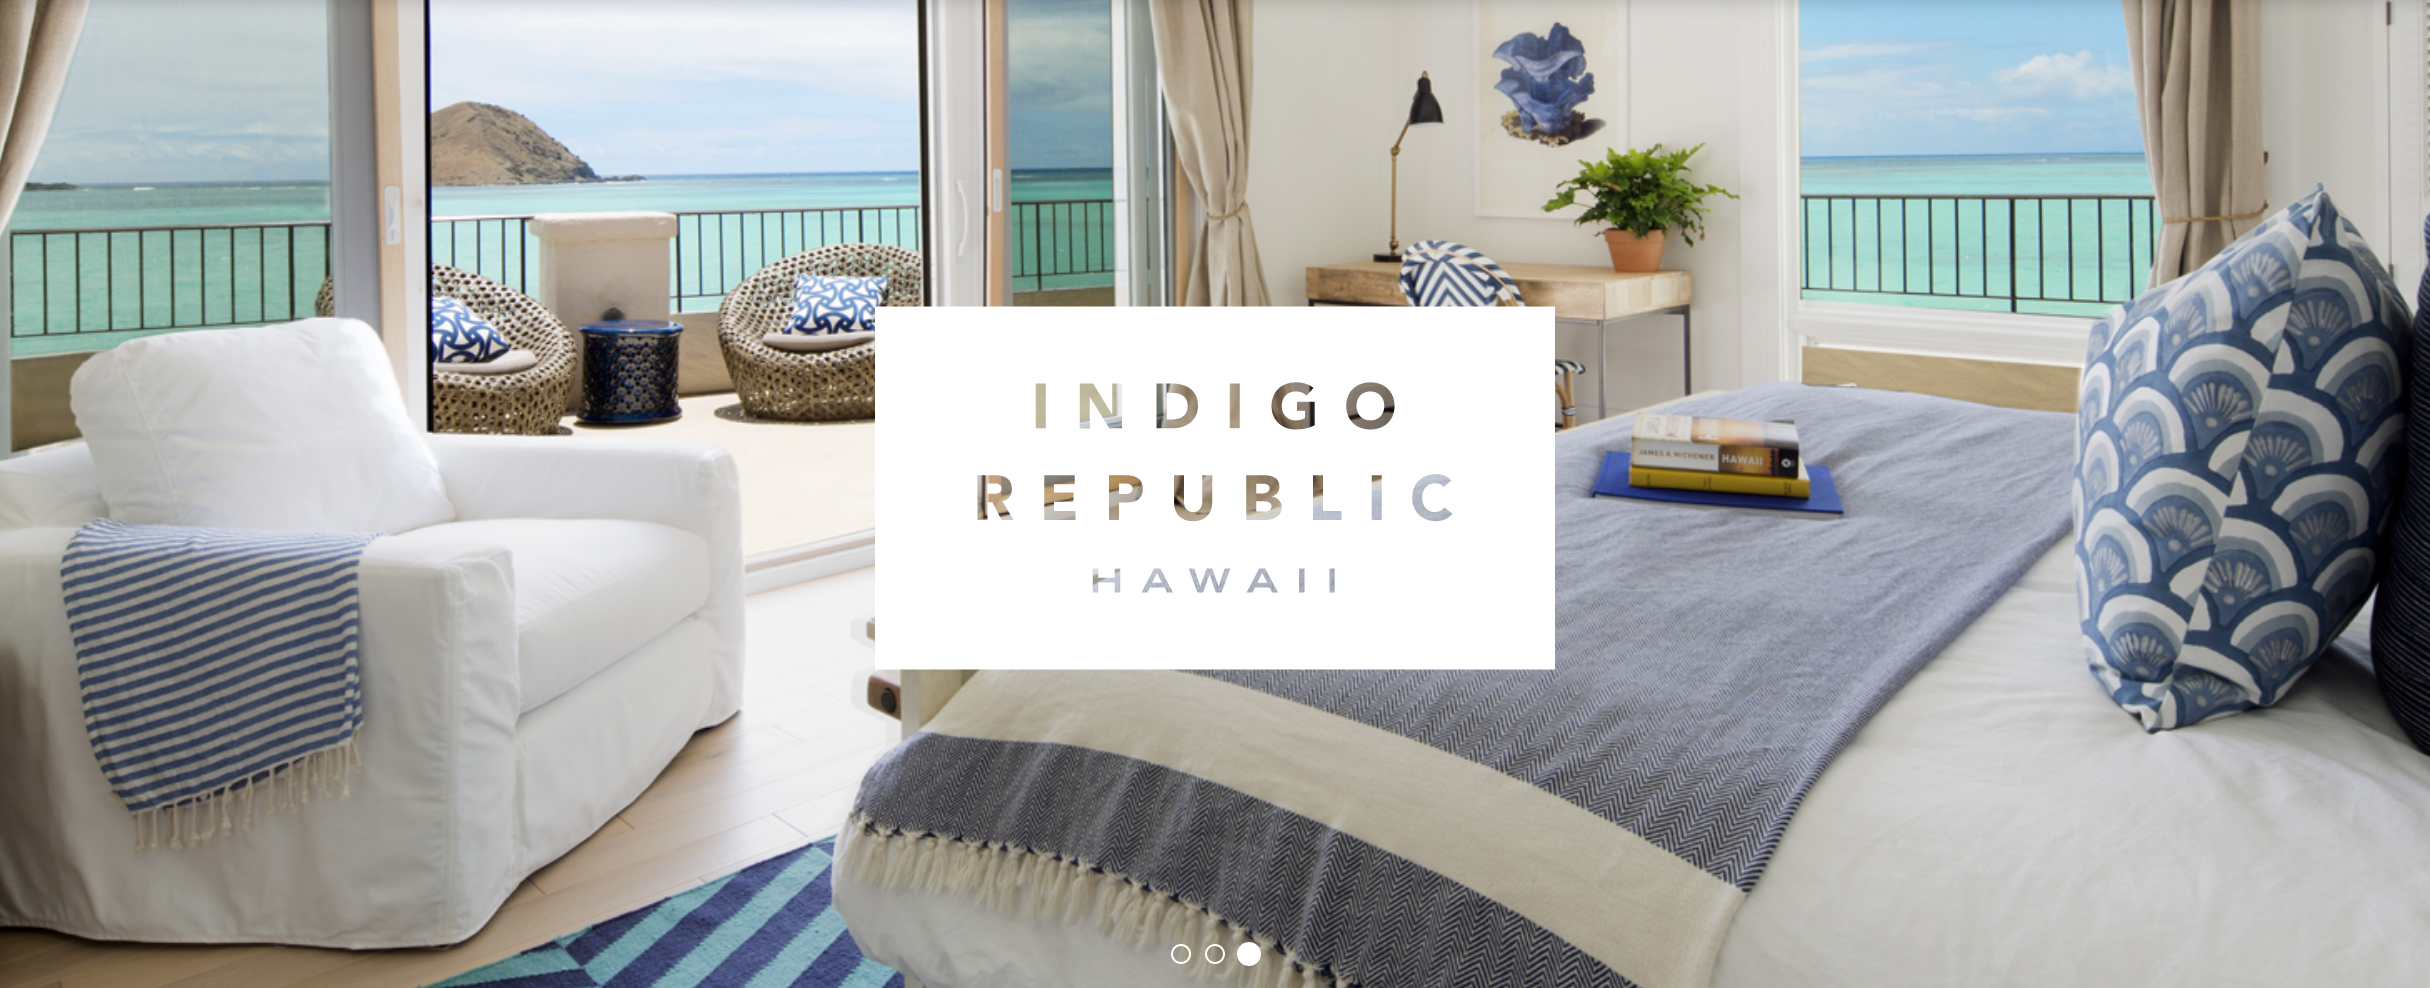 Indigo Republic.png